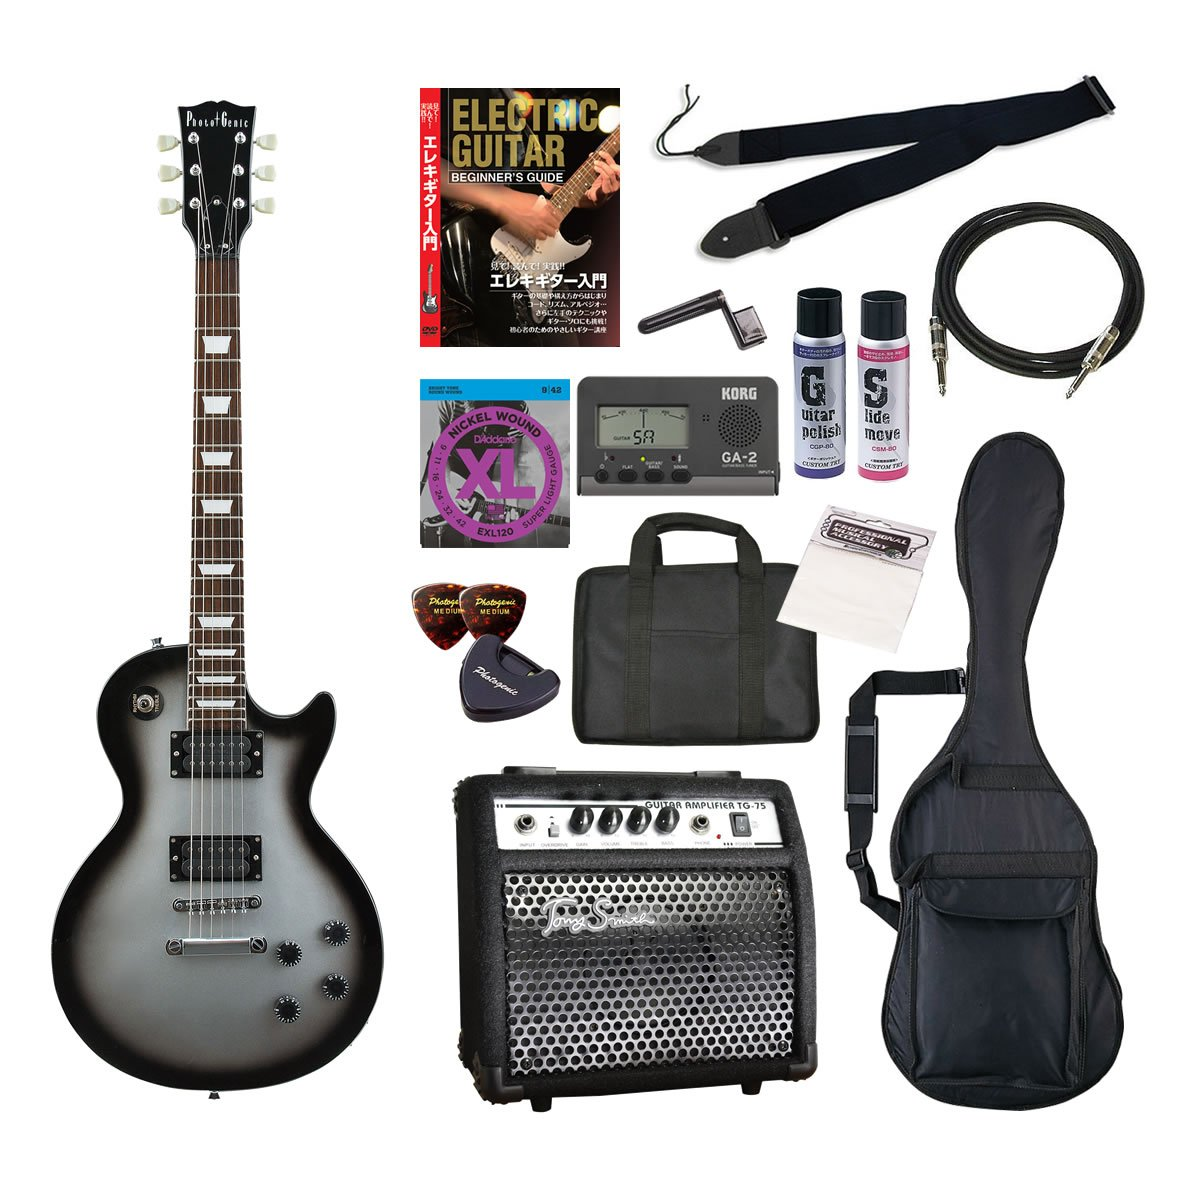 PhotoGenic エレキギター 初心者入門年始セット レスポールタイプ LP-260/SVB シルバーバースト B009HOL0C2 シルバーサンバースト シルバーサンバースト